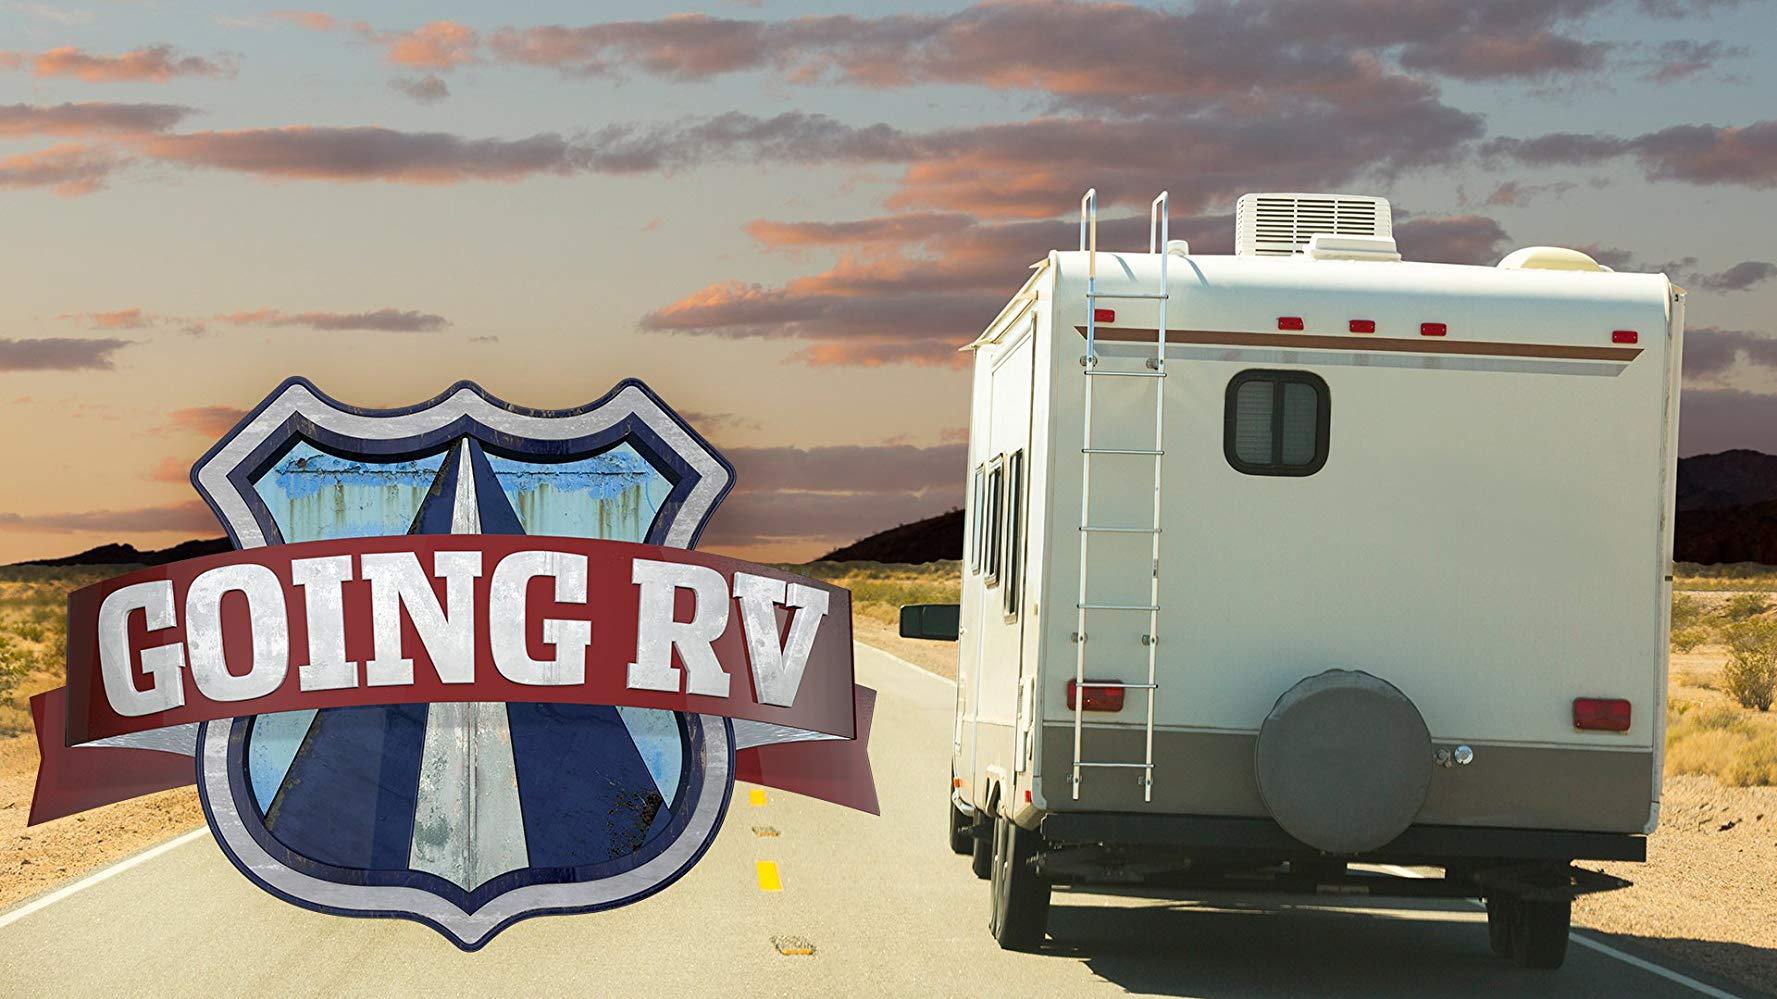 Going RV S01E13 HDTV x264-dotTV